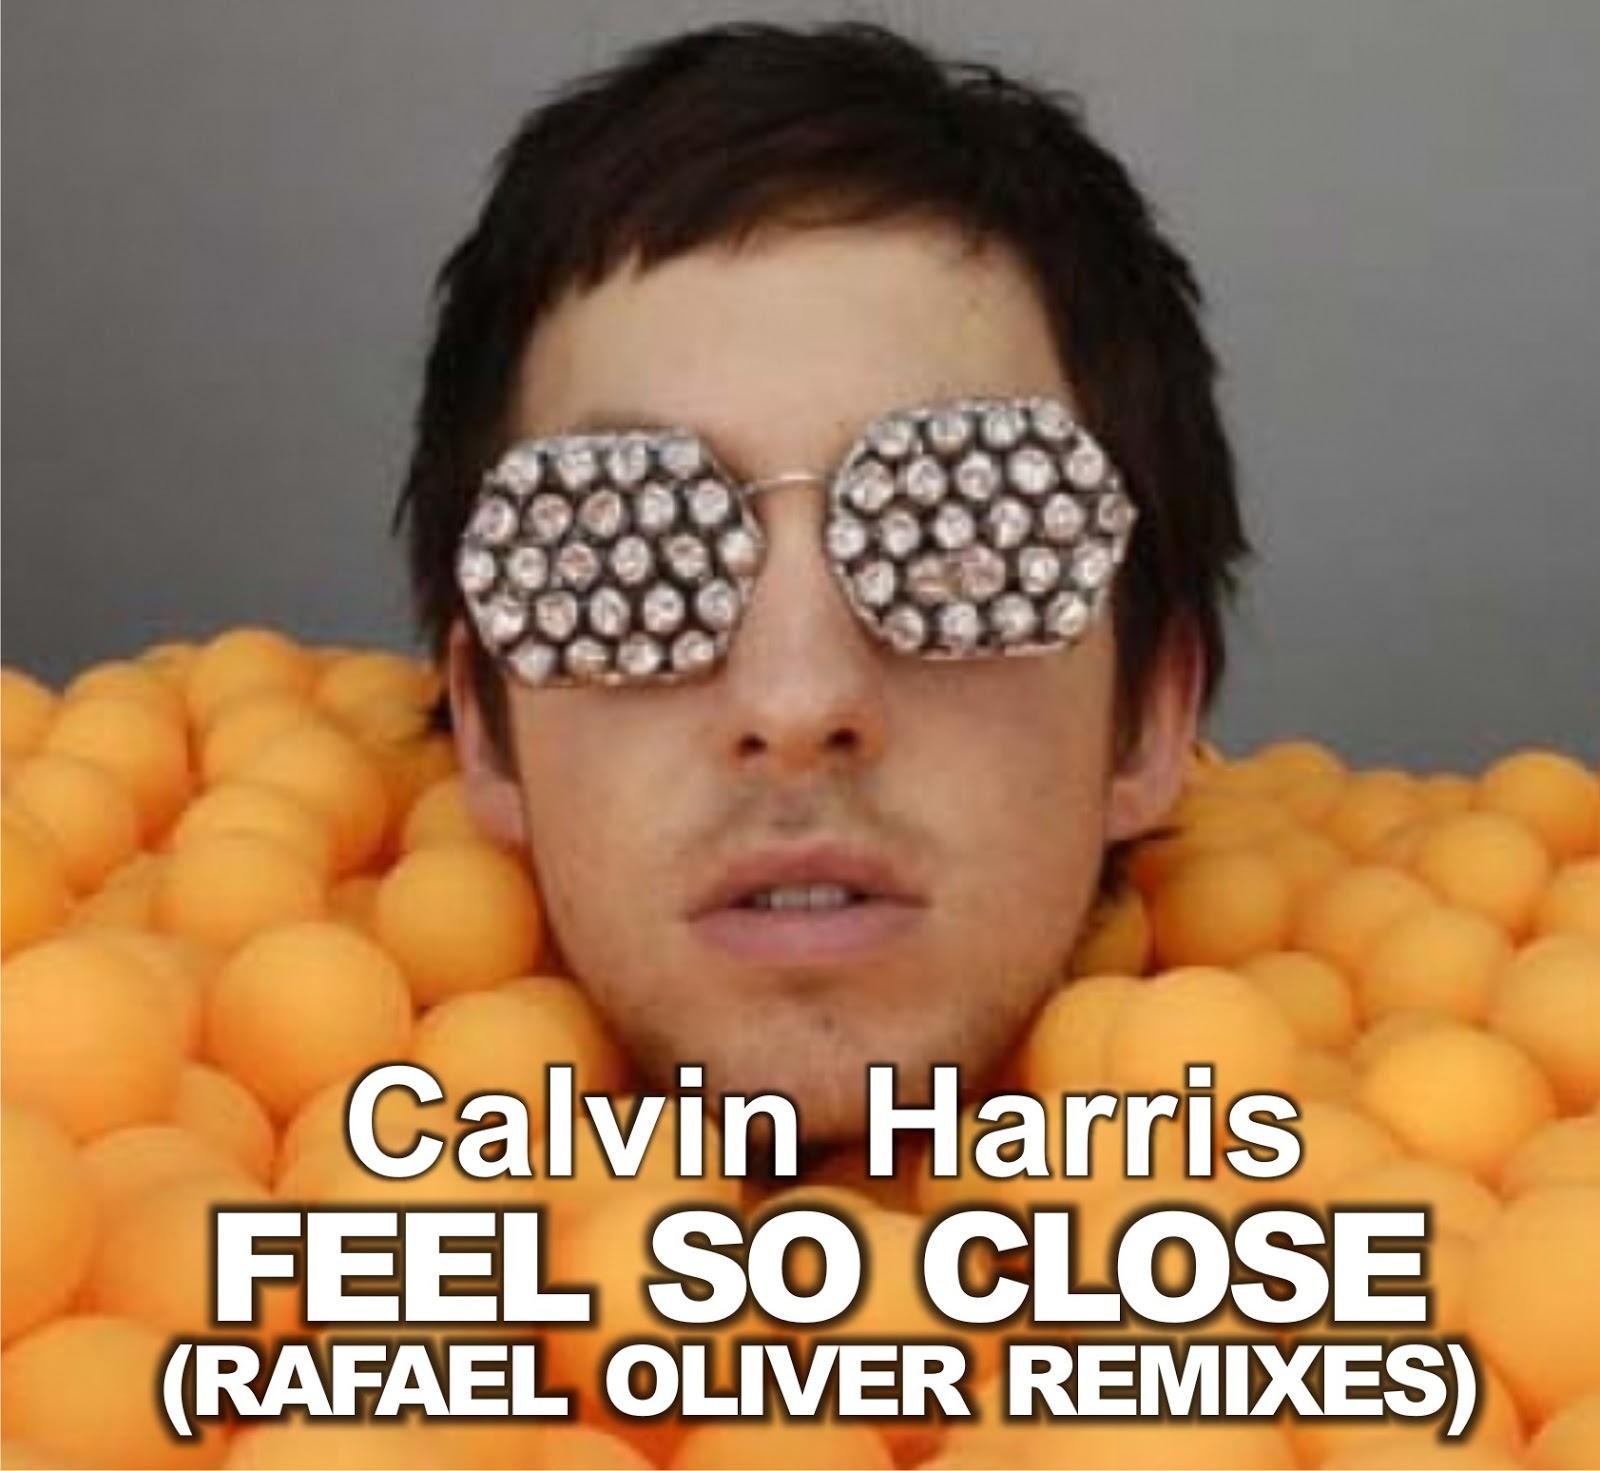 calvin harris feel so close - HD1600×1471